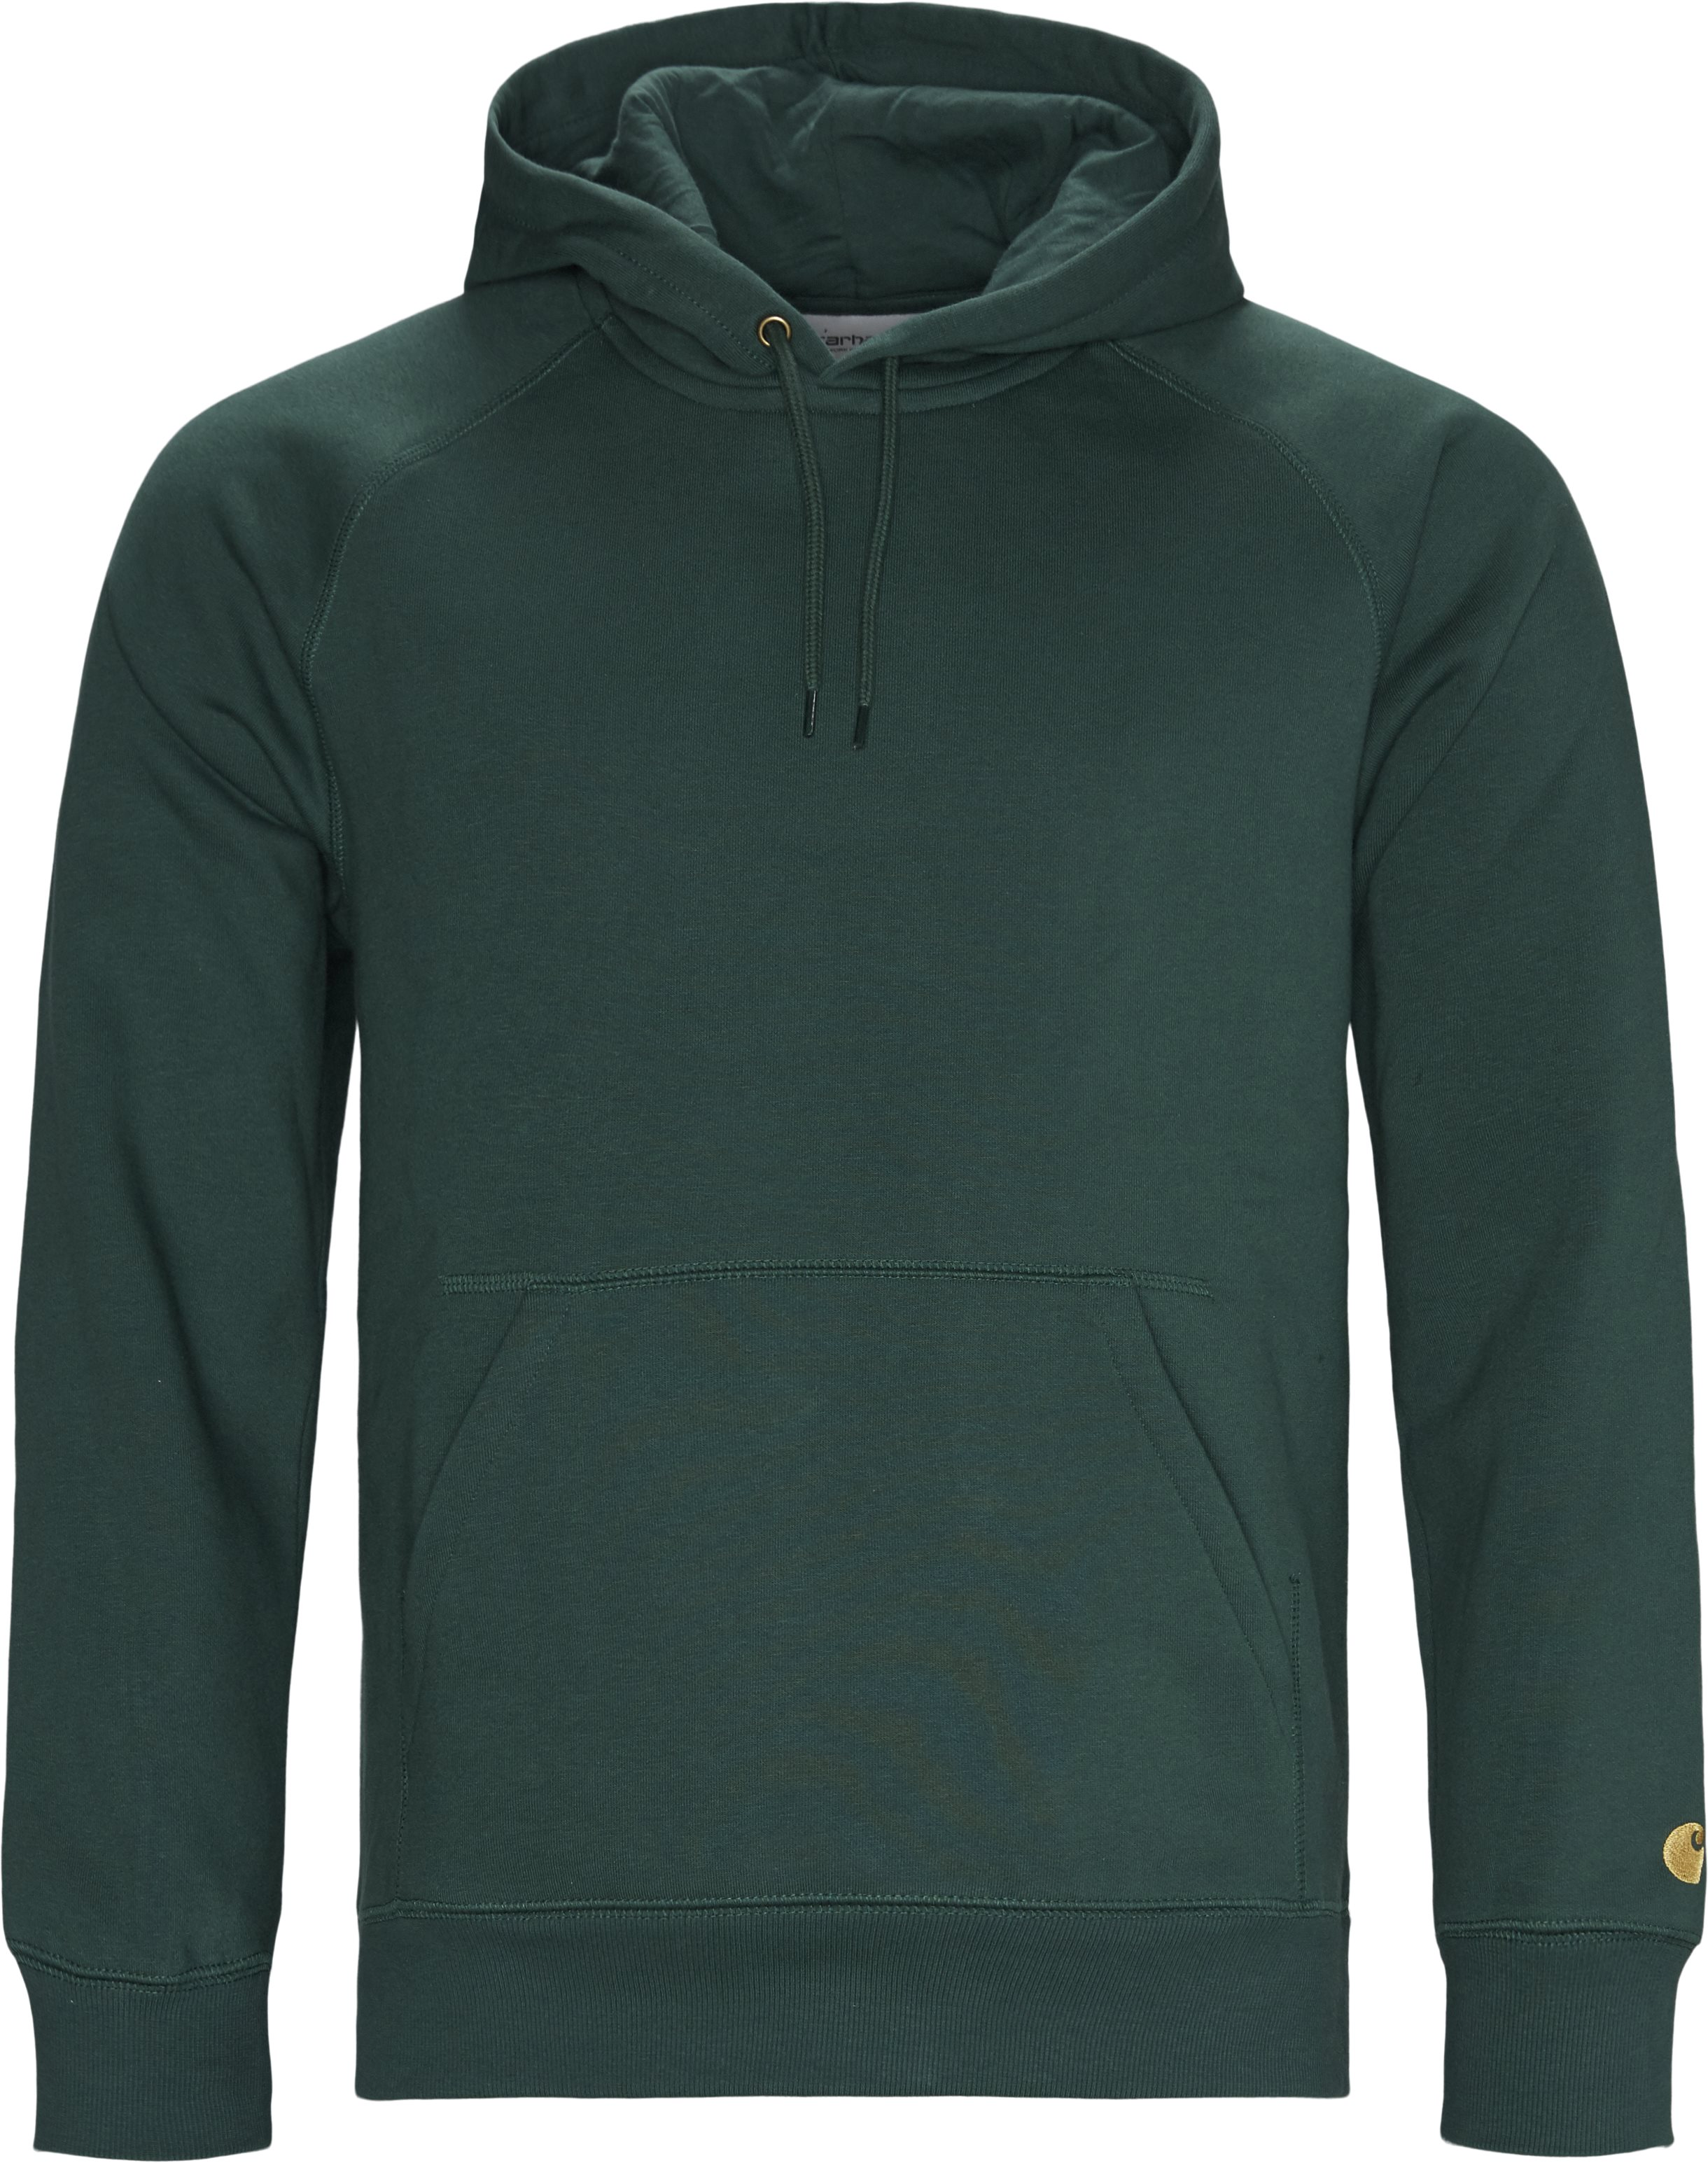 Hooded Chase Sweatshirt - Sweatshirts - Regular fit - Grøn